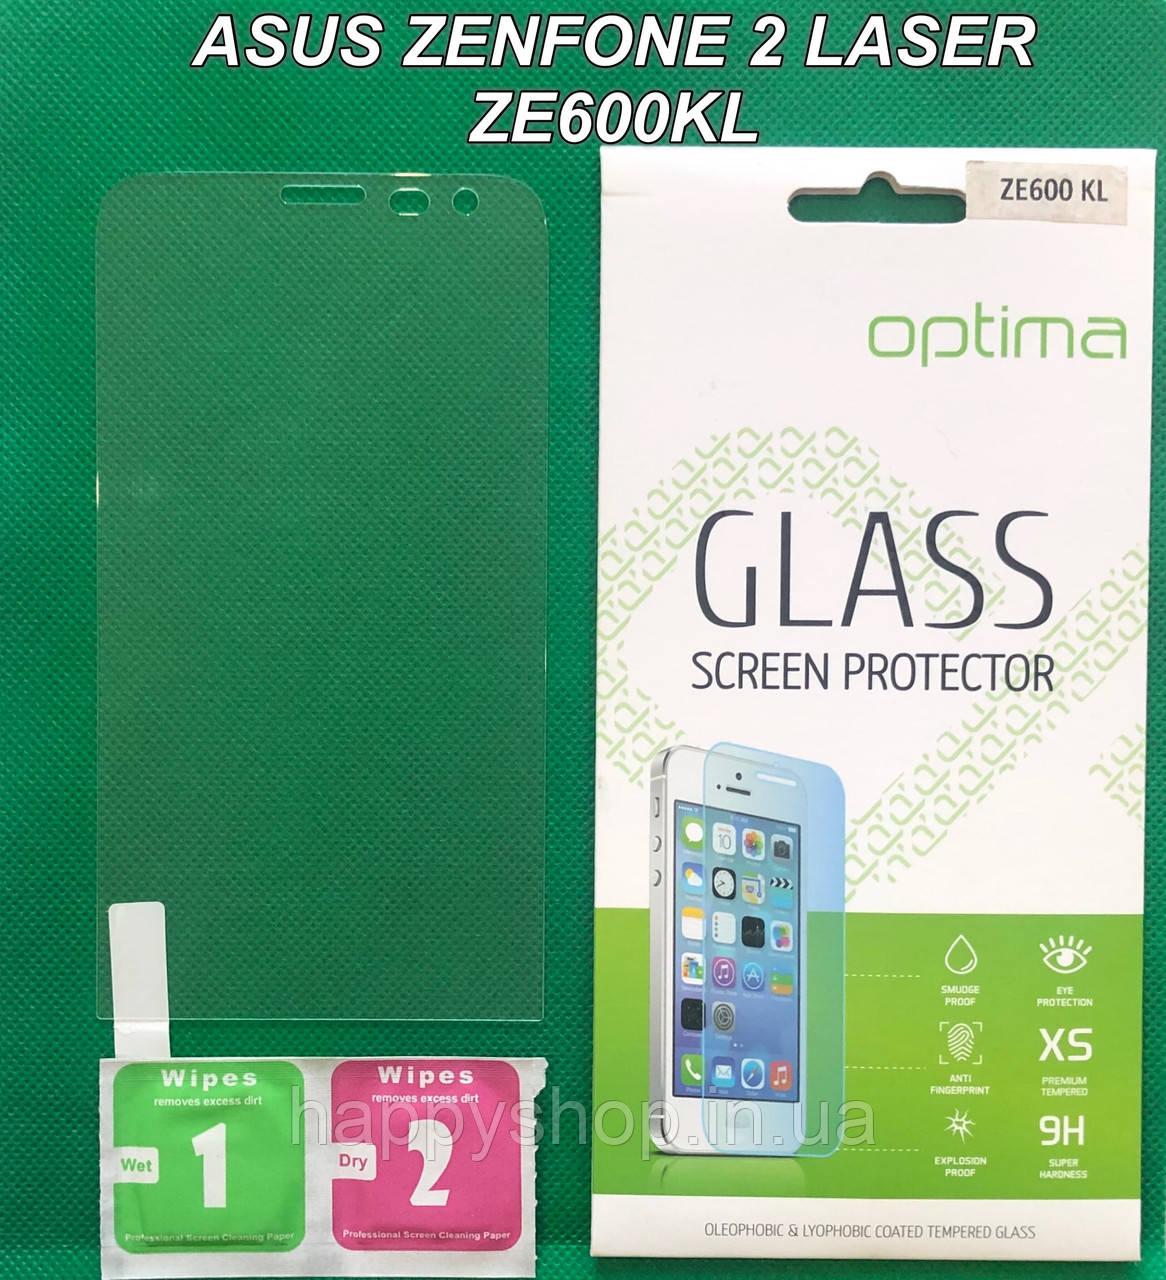 Защитное стекло Asus Zenfone 2 Laser ZE600KL